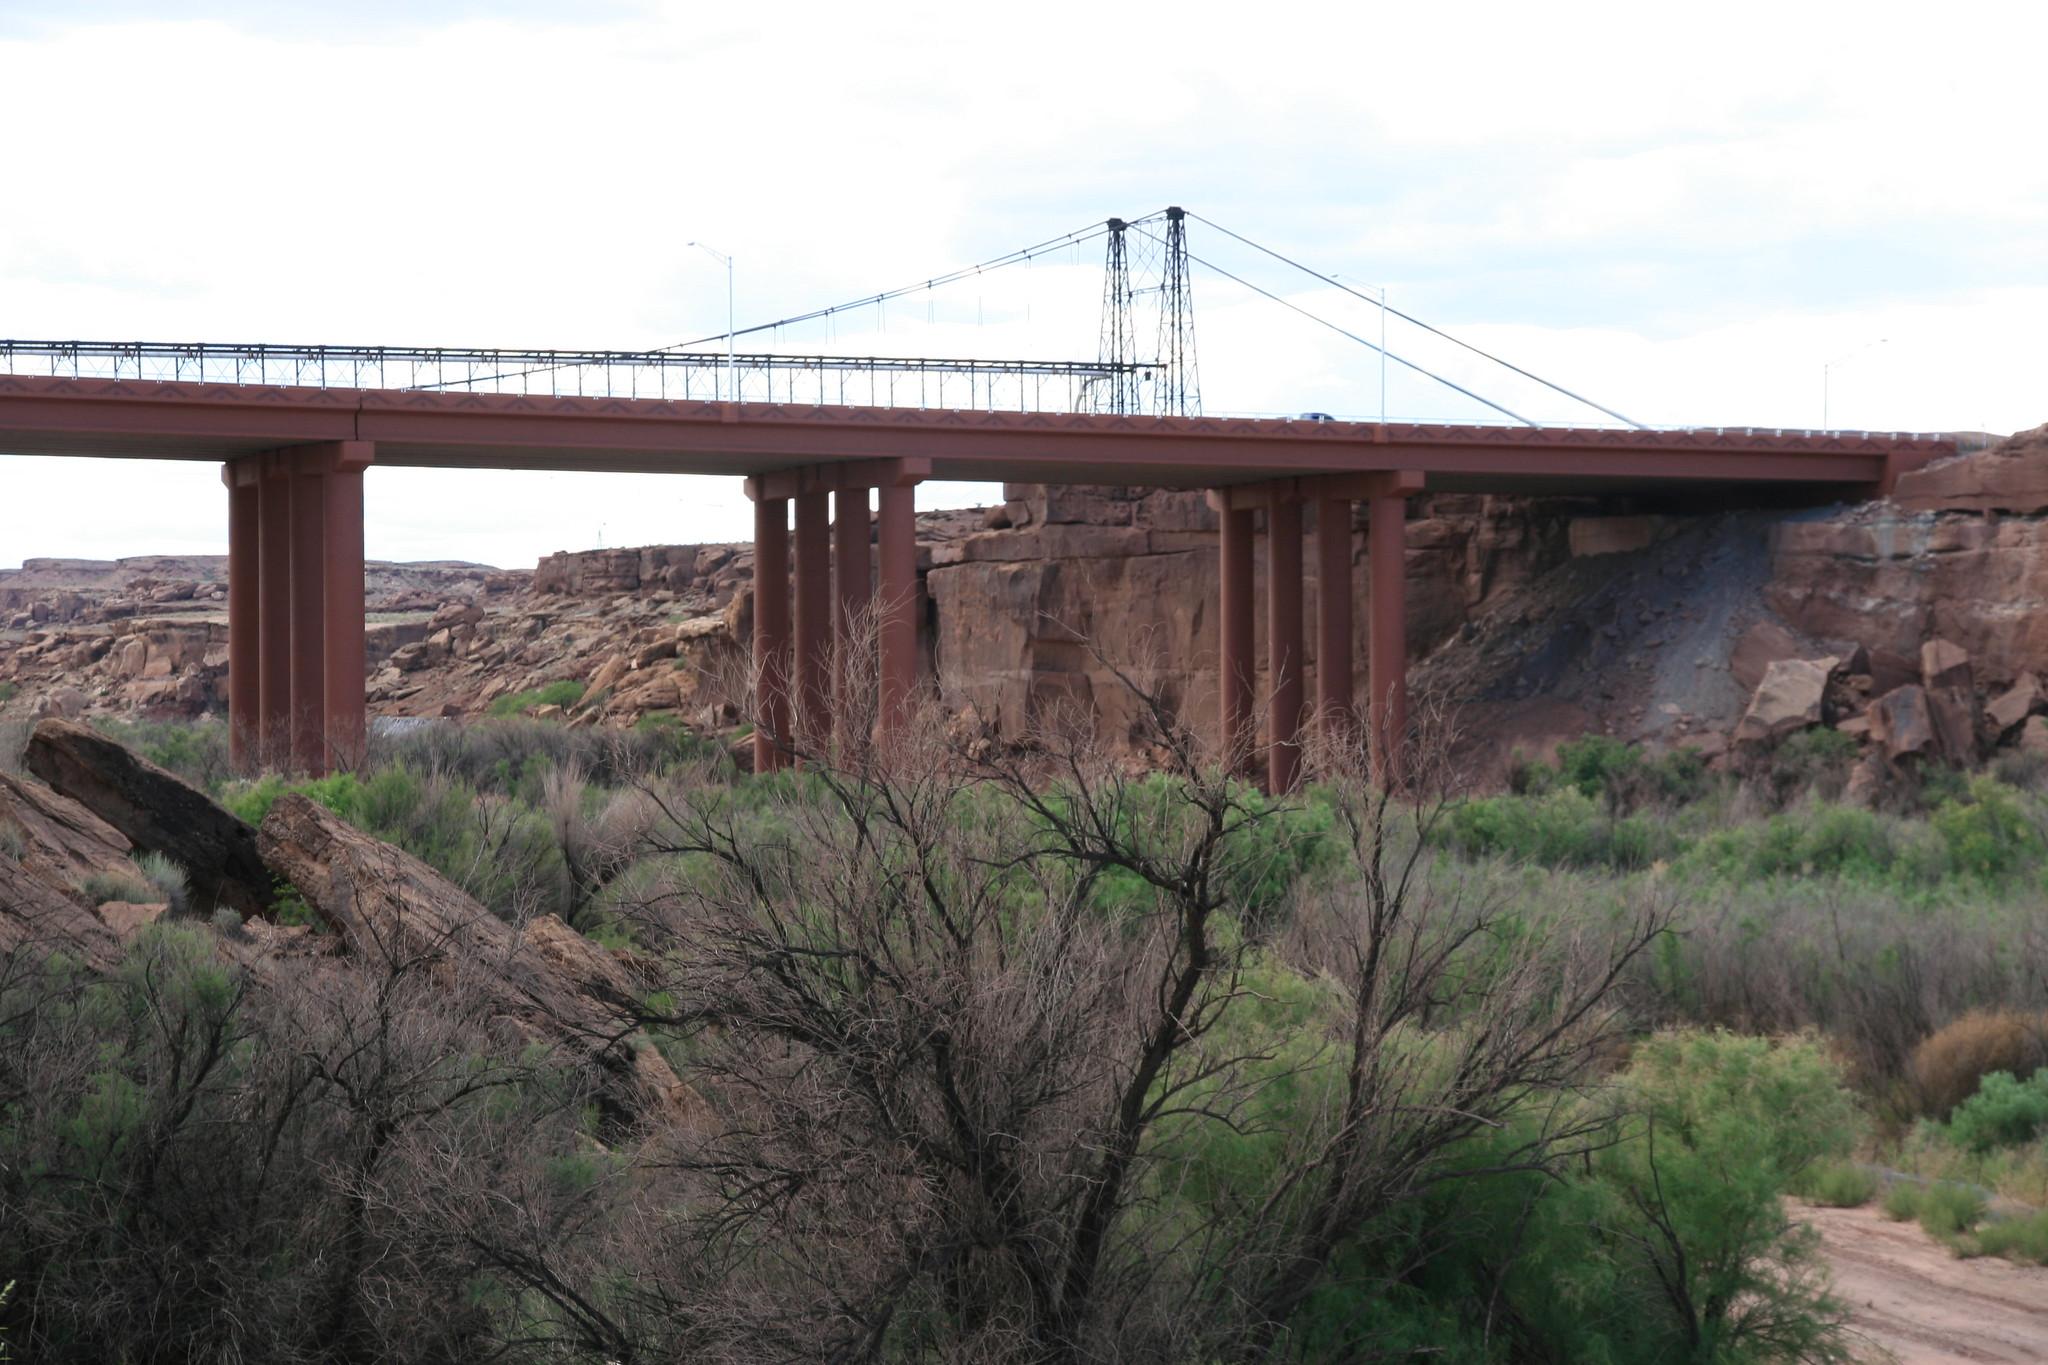 The new bridge over the Little Colorado River near Cameron